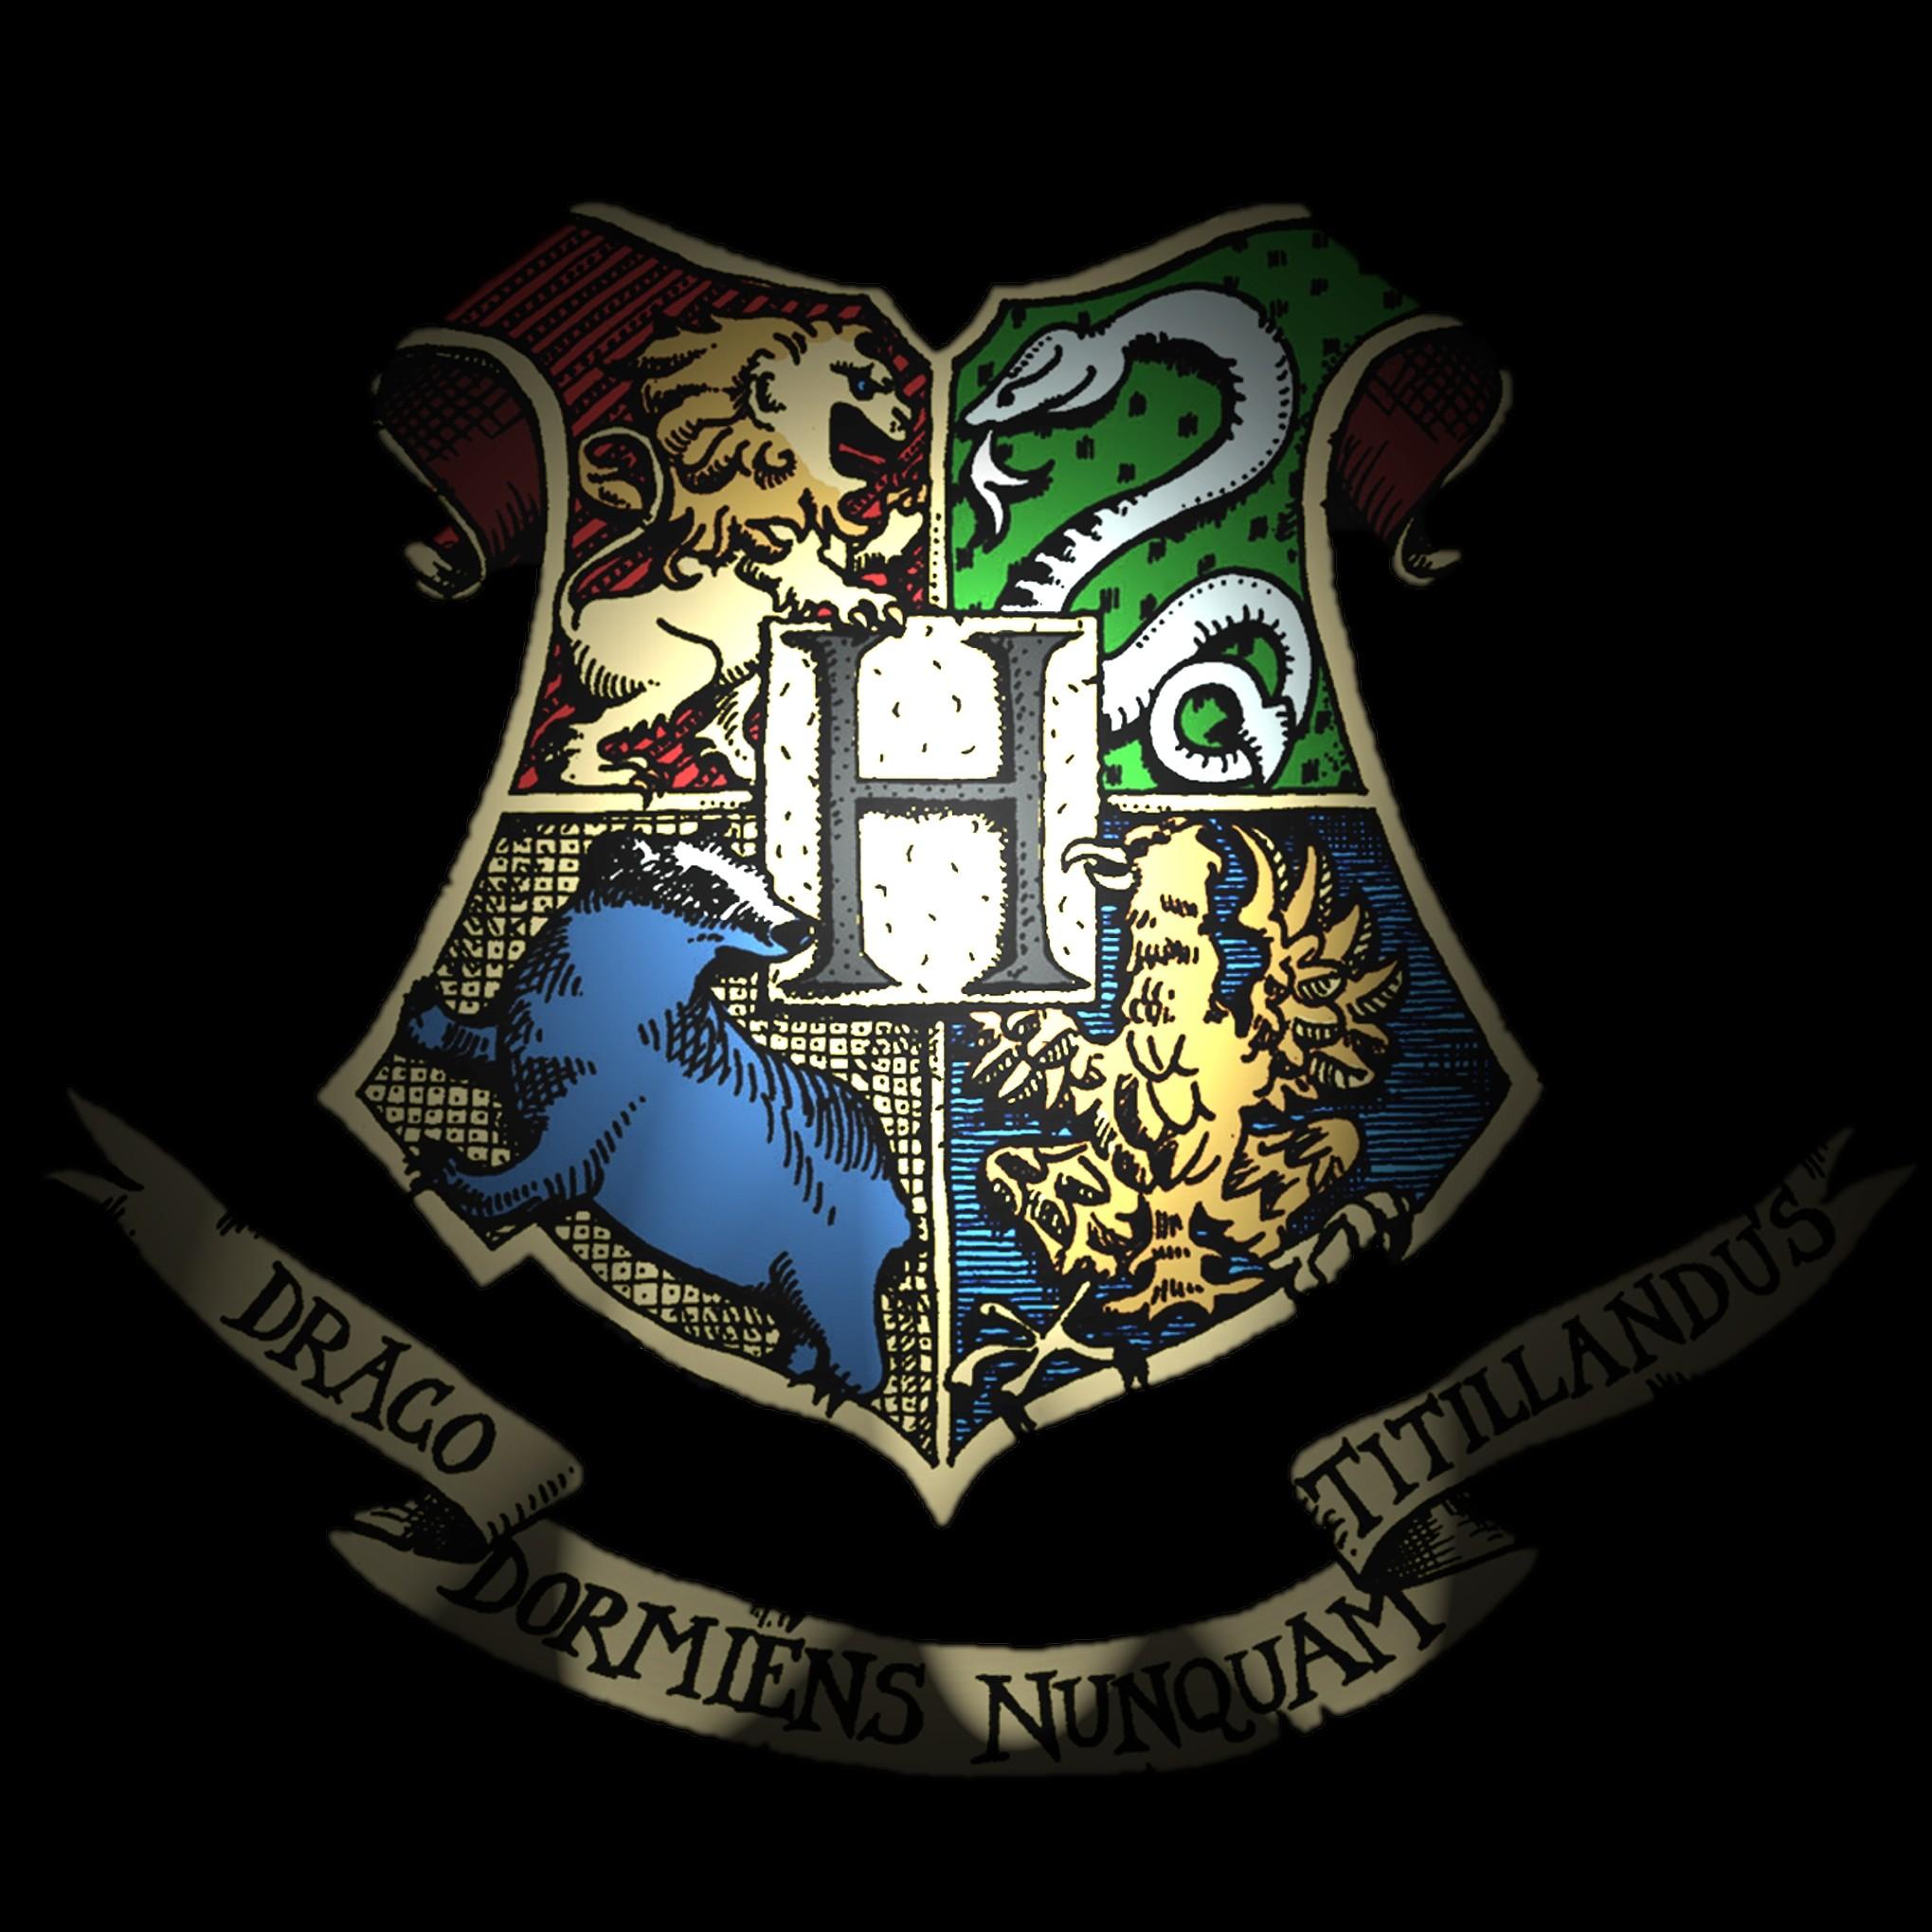 related harry potter hogwarts crest wallpaper harry potter hogwarts .